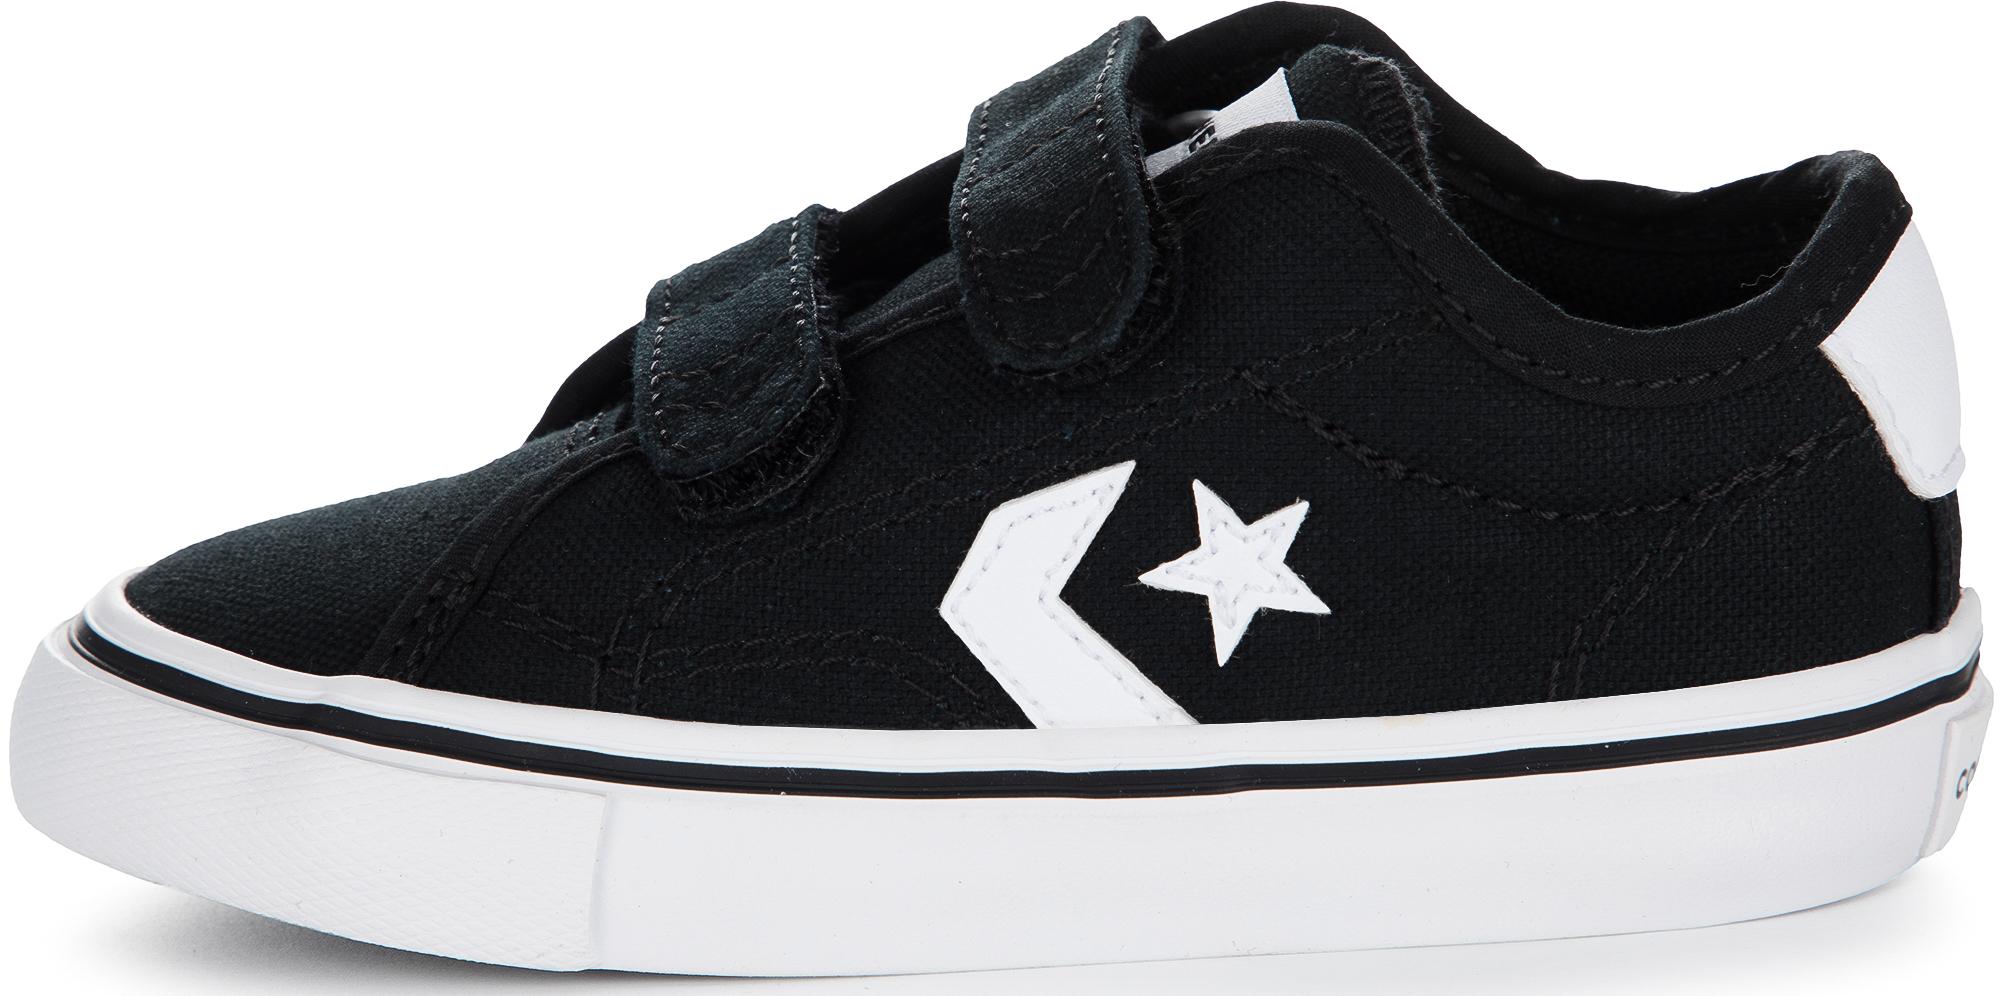 Converse Кеды для мальчиков Star Replay 2V, размер 25